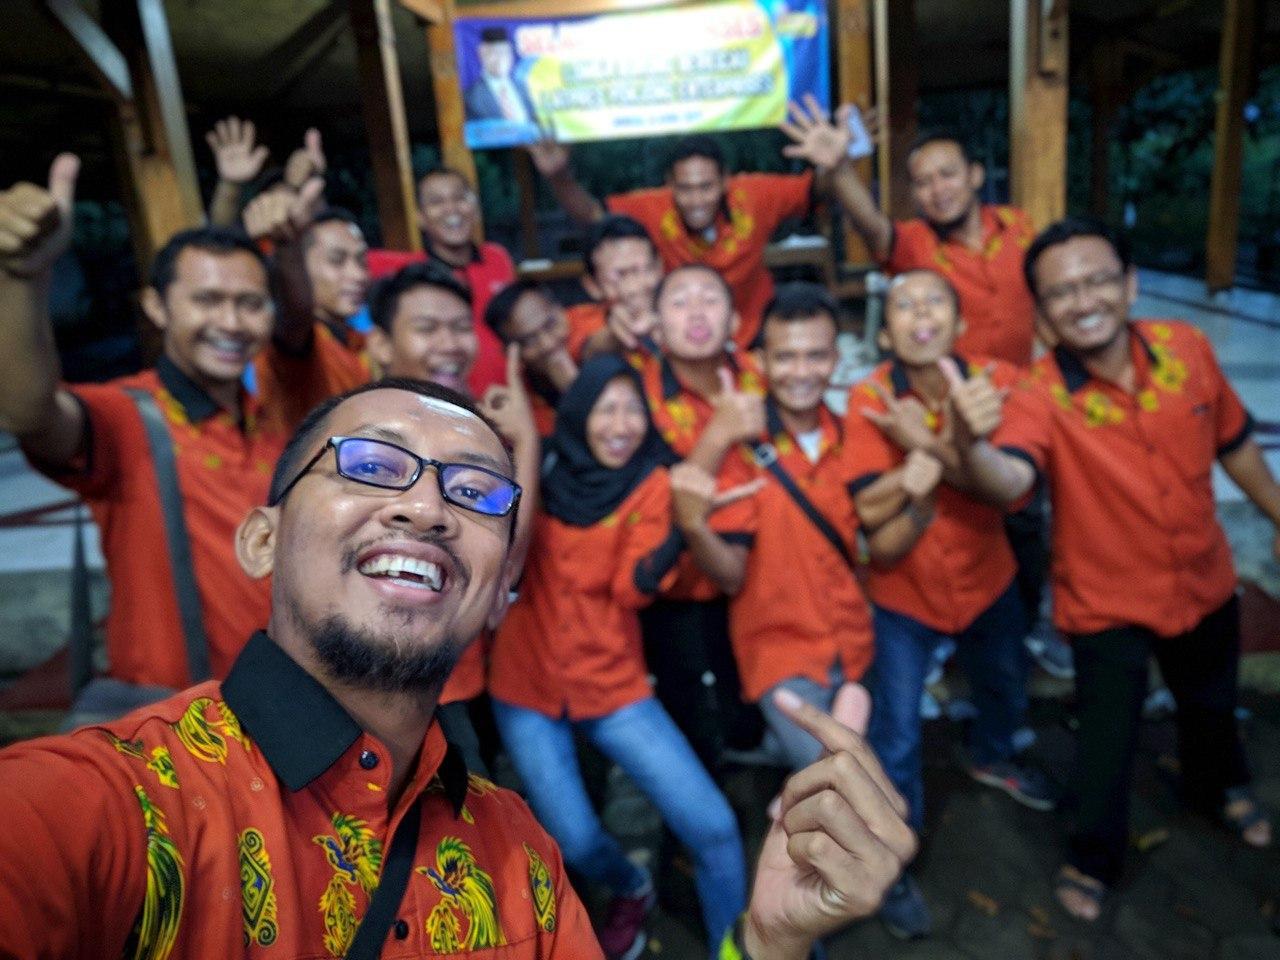 Guyup Rukun Ponjong Enterprises bersama Anang Sutrisno Arif Nurdiyanto Deni Kurniawan Tongki Danang Kliwon Si Muh dan Team